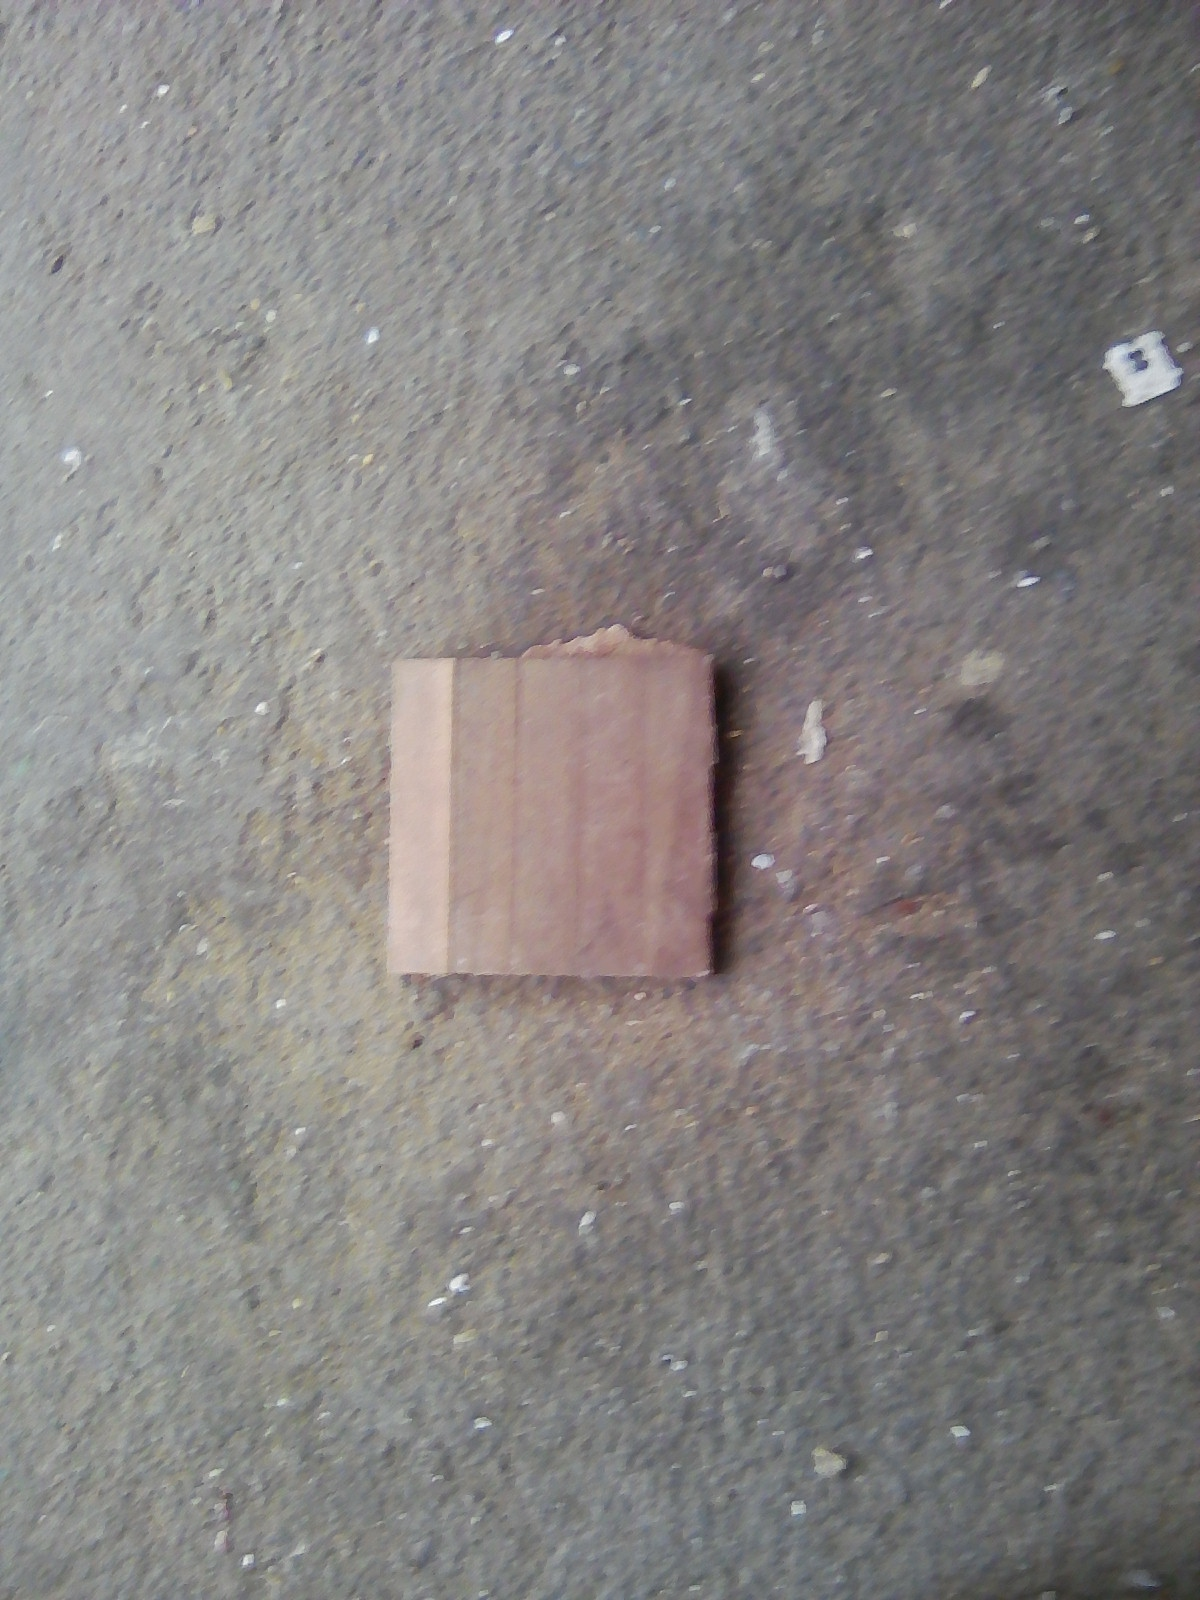 Small finger Parquet blocks(mosaic) for sale